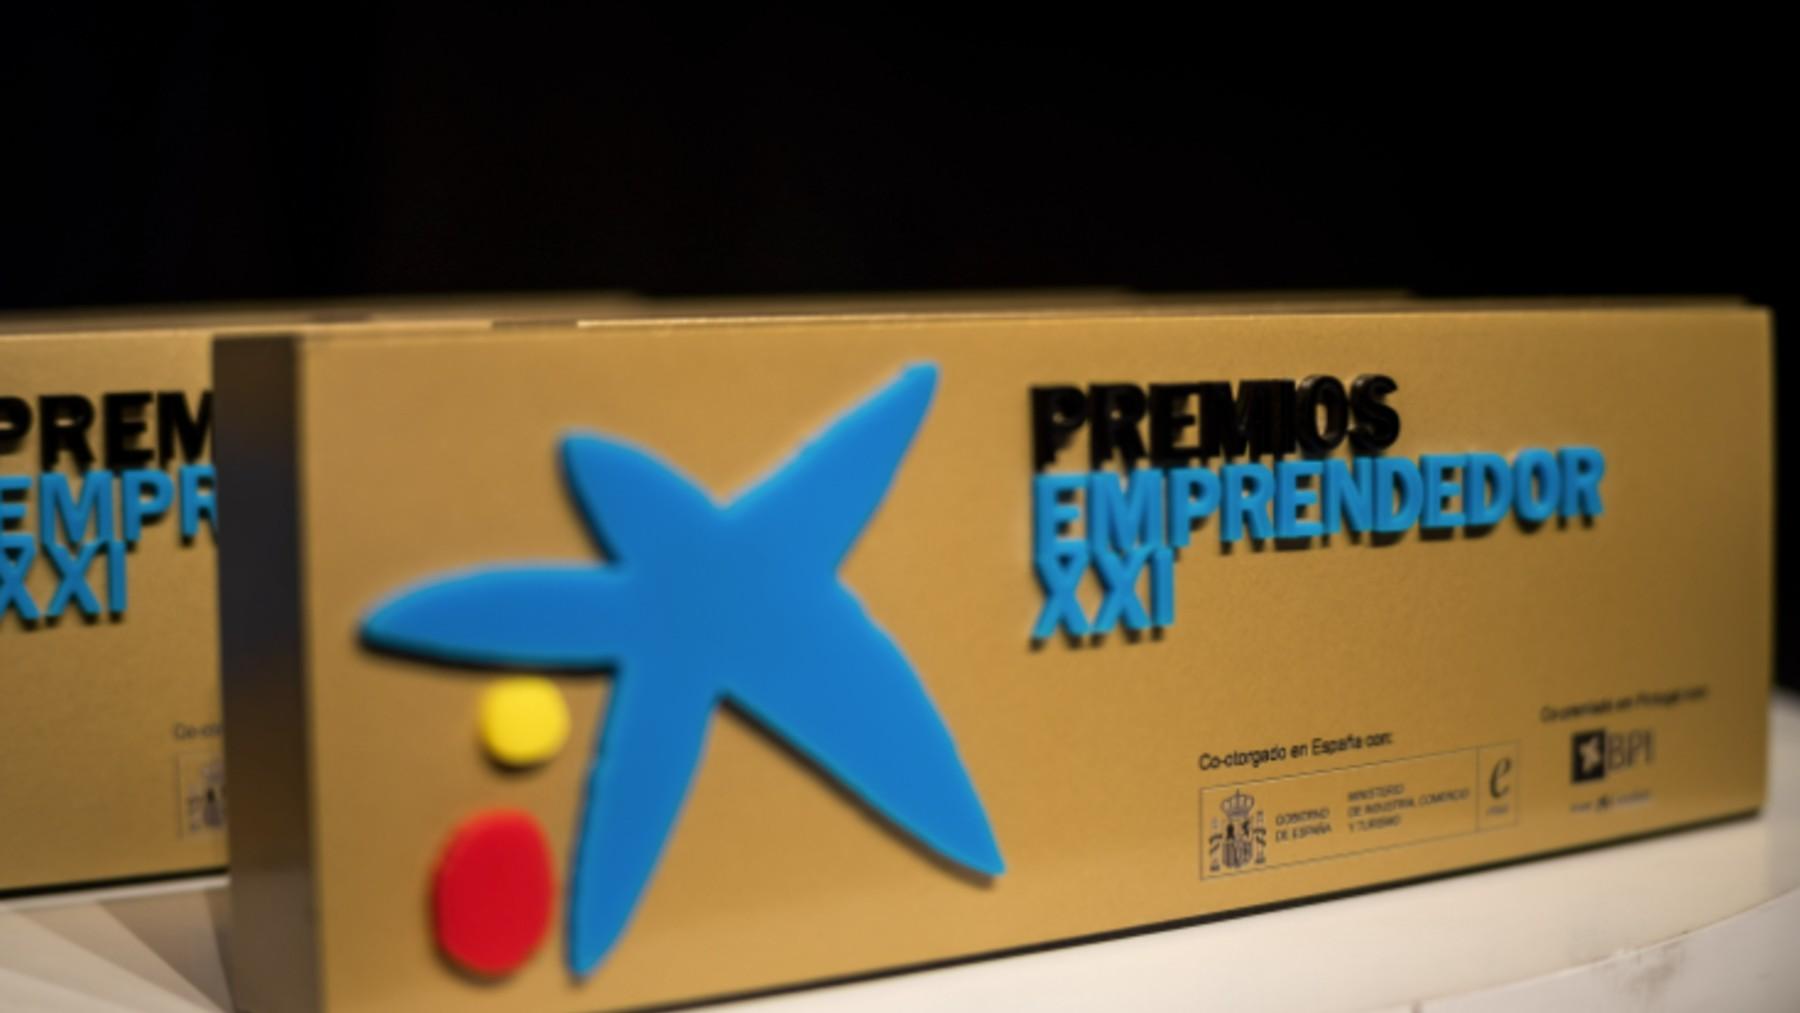 Premios Emprendedor XXI